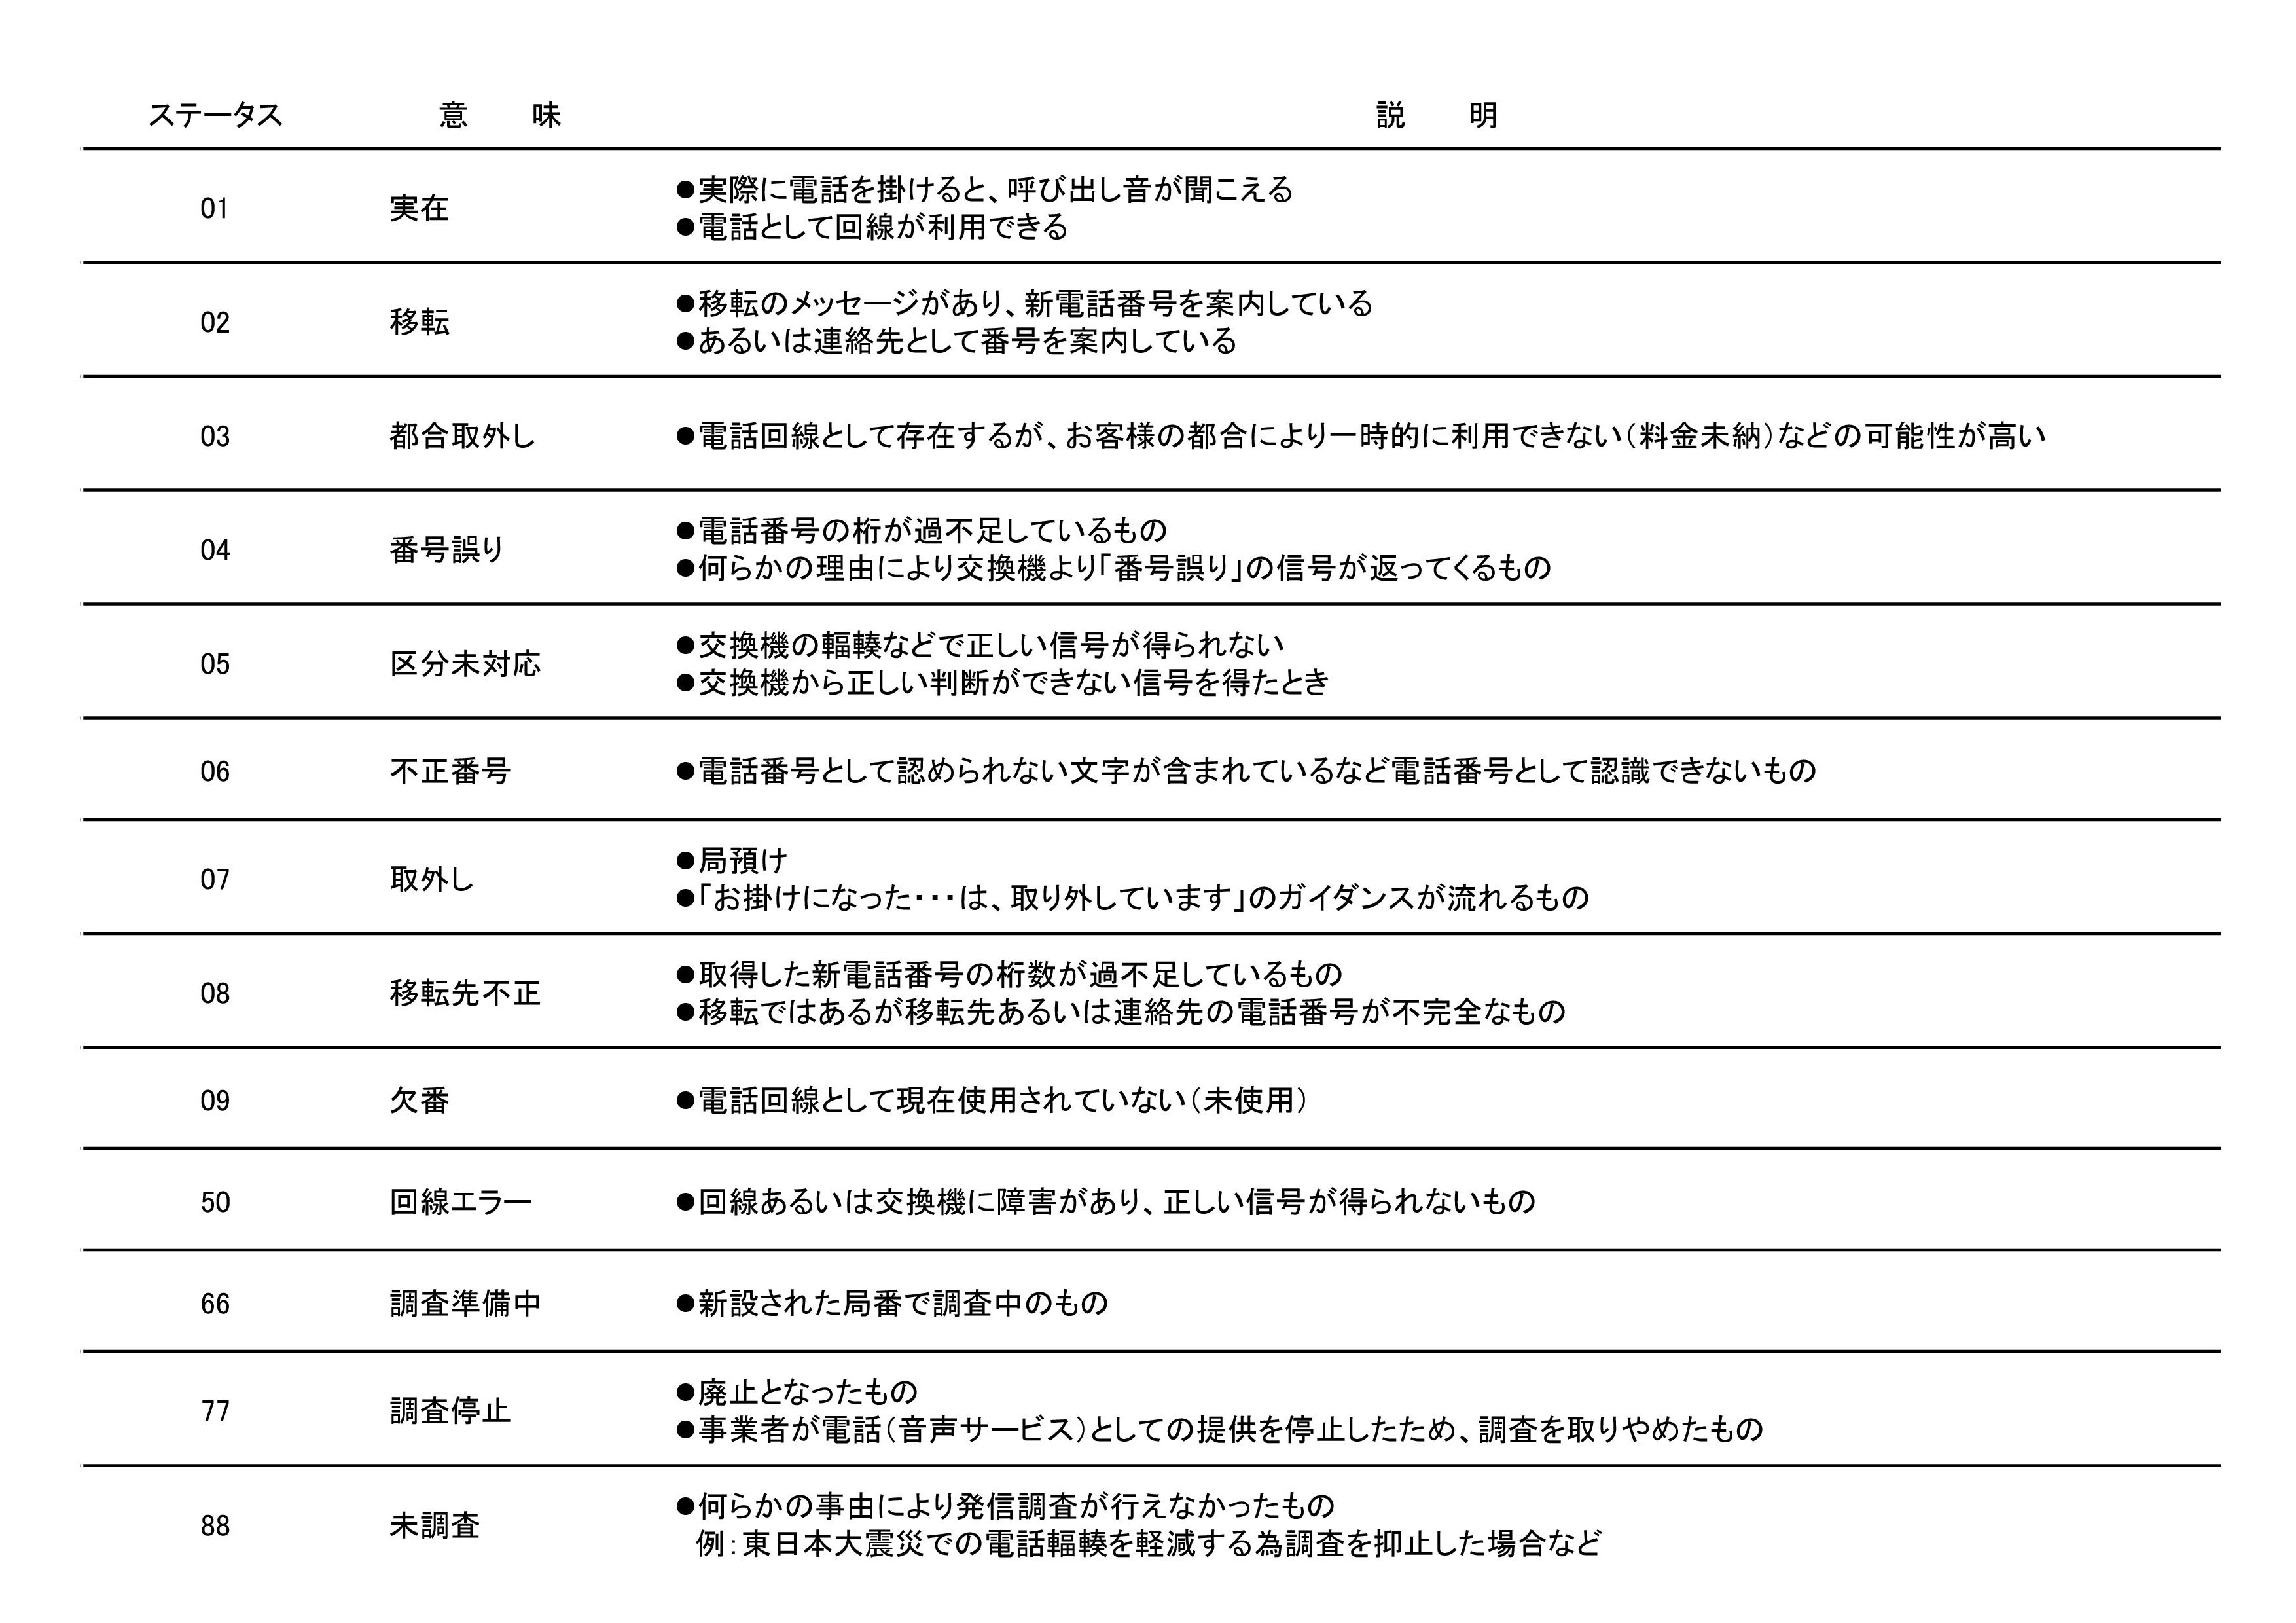 Microsoft PowerPoint - 20160506_【原本】電話調査システム企画書